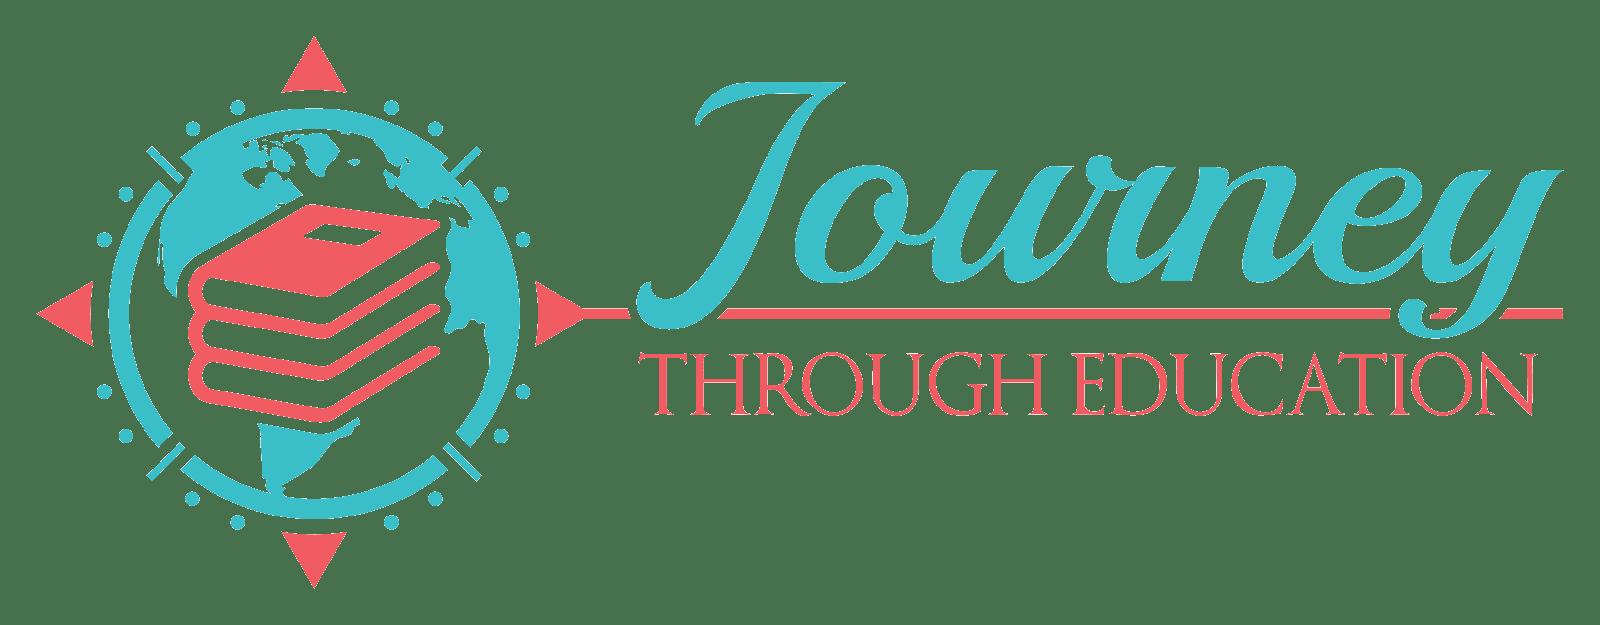 Journey Through Education